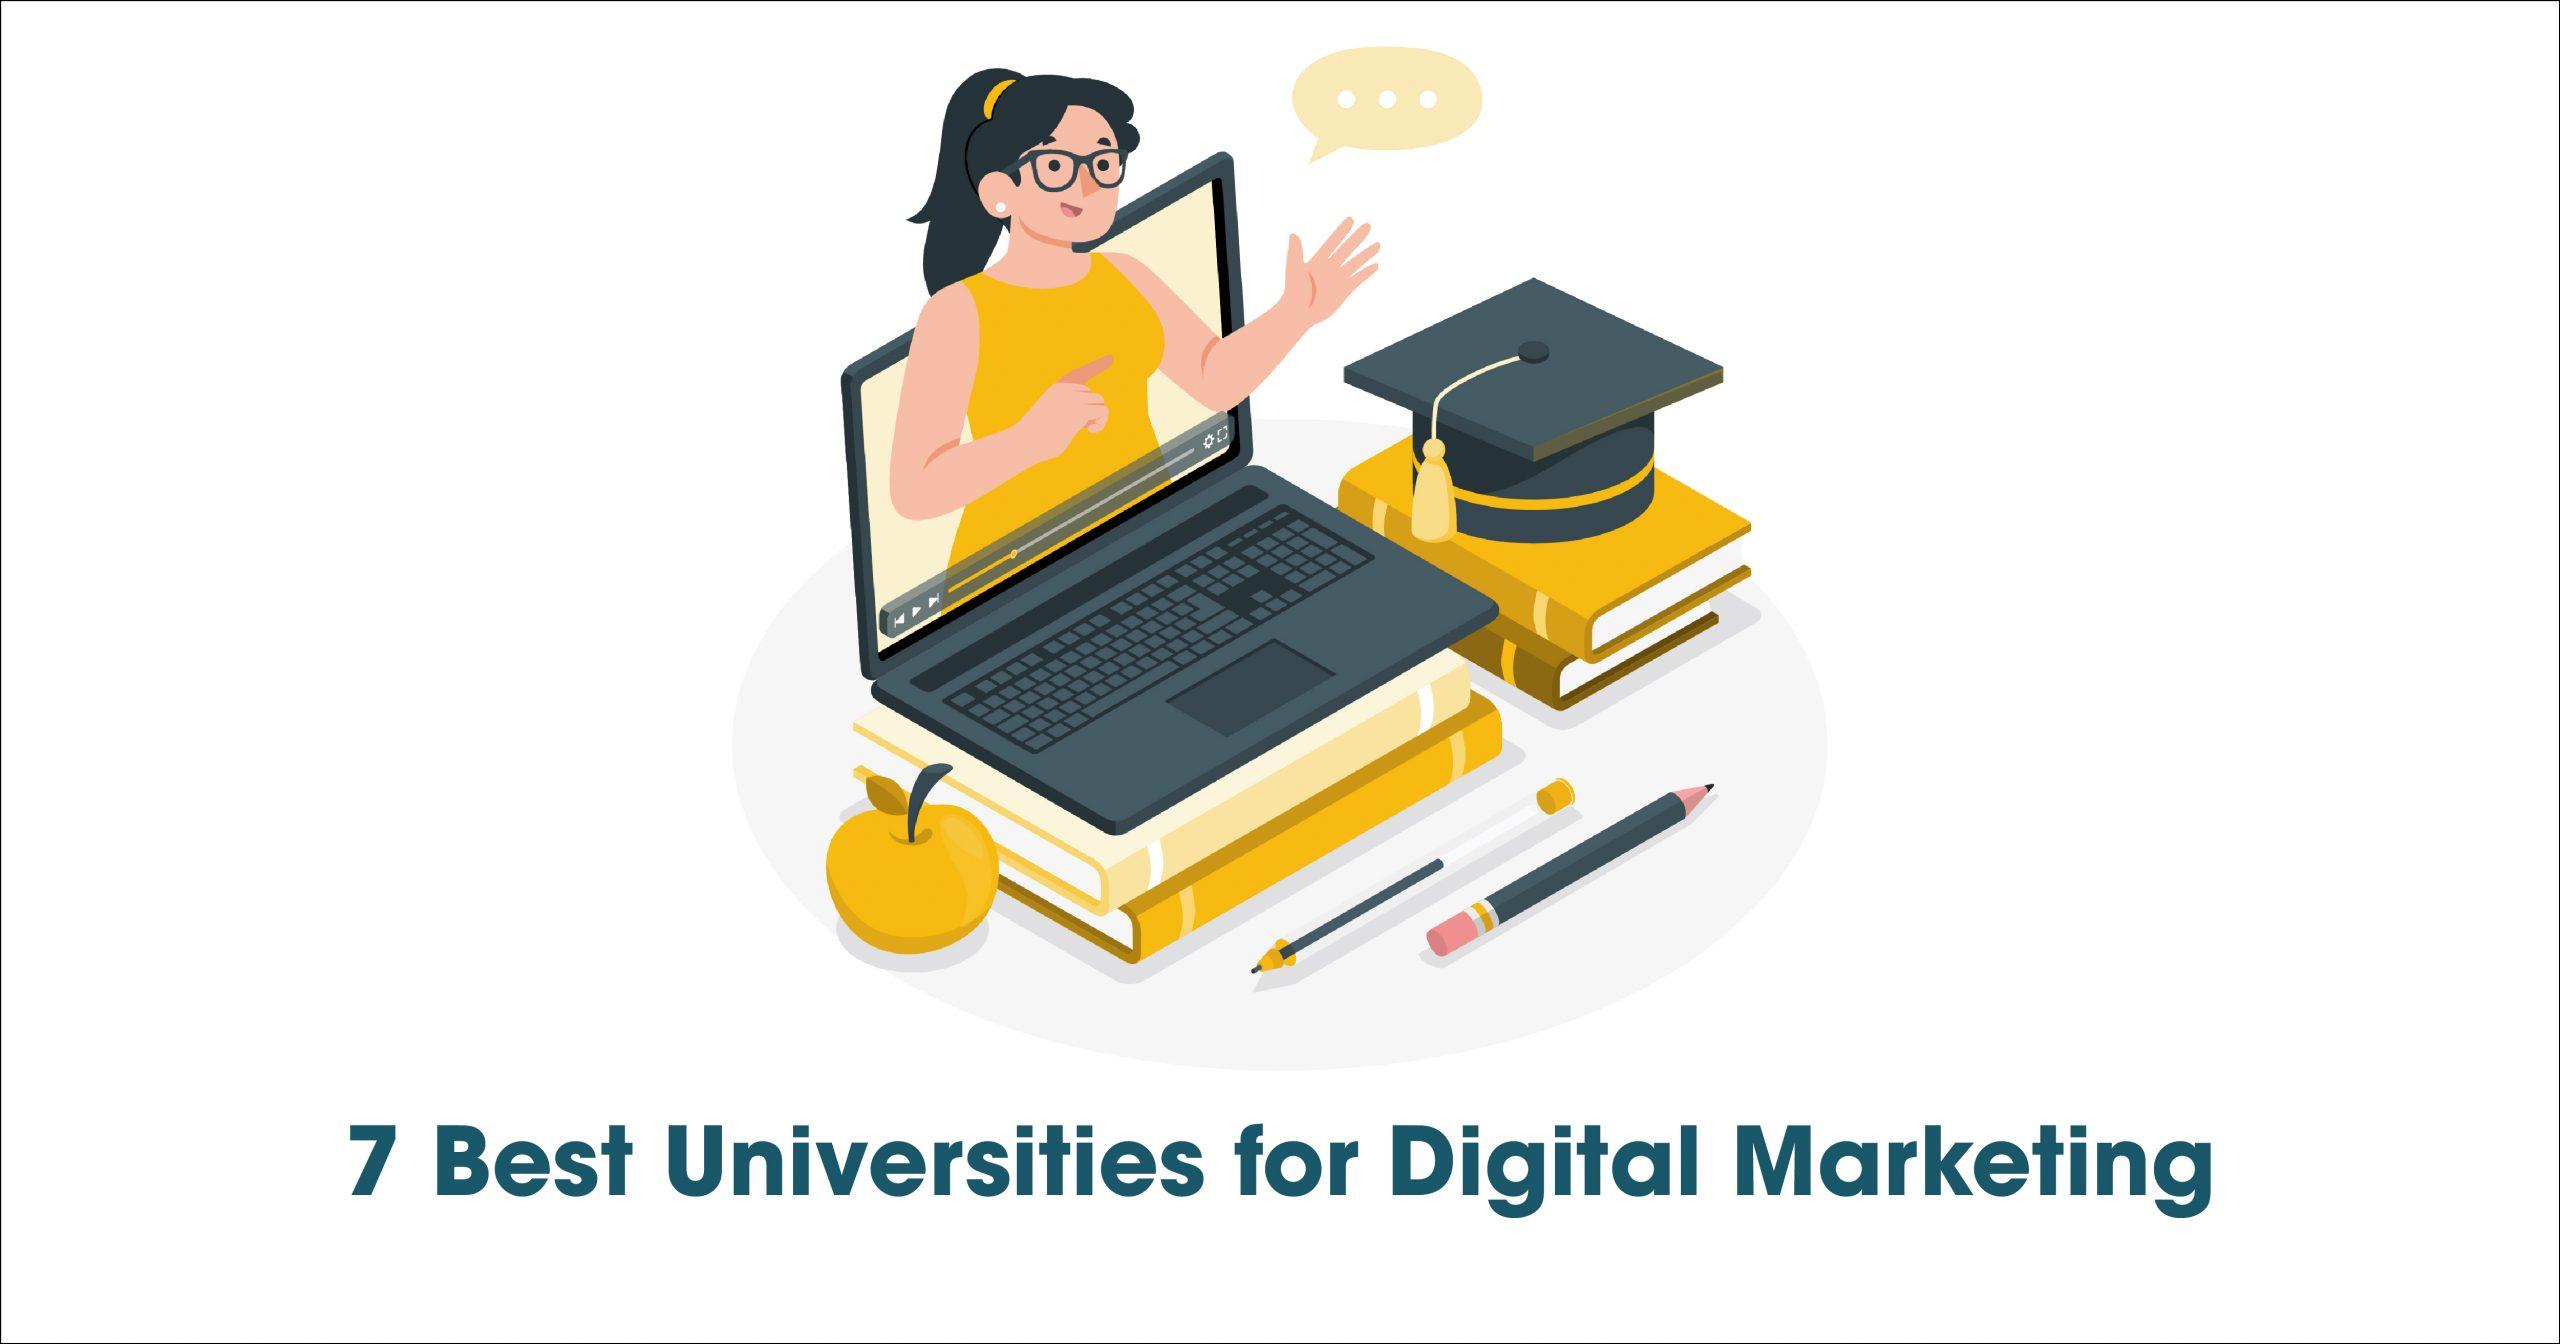 7-Best-Universities-for-Digital-Marketing